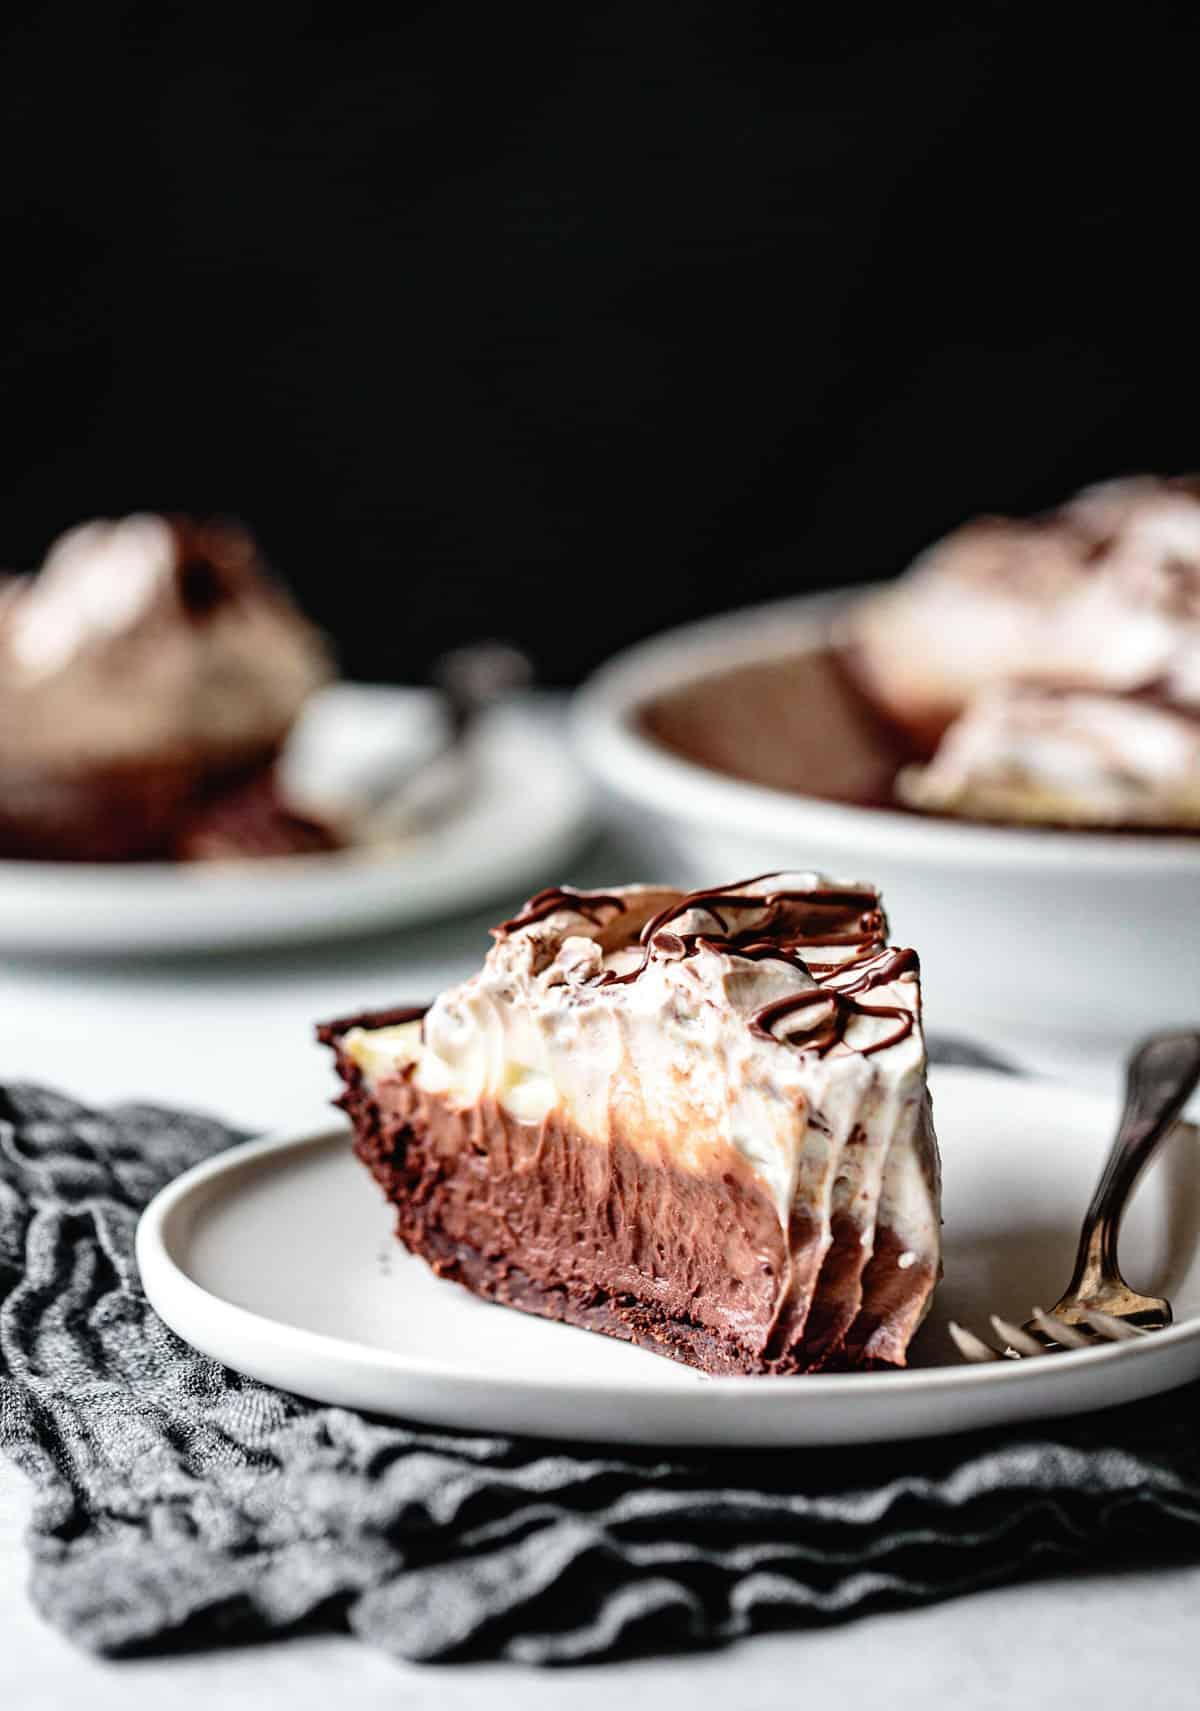 gluten-free chocolate recipes: triple chocolate pie